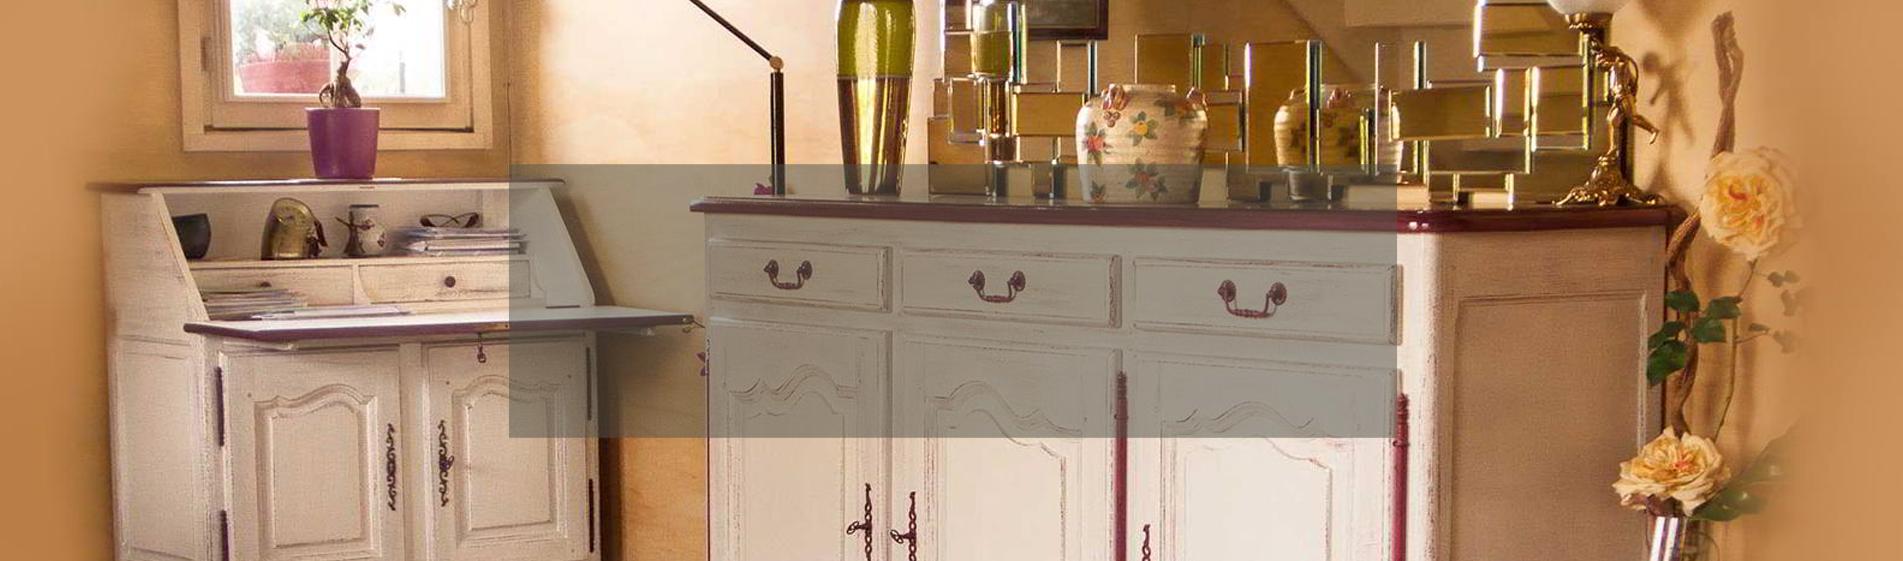 slider_accueil-peinture-decorative-ateliersrenard-decapage91